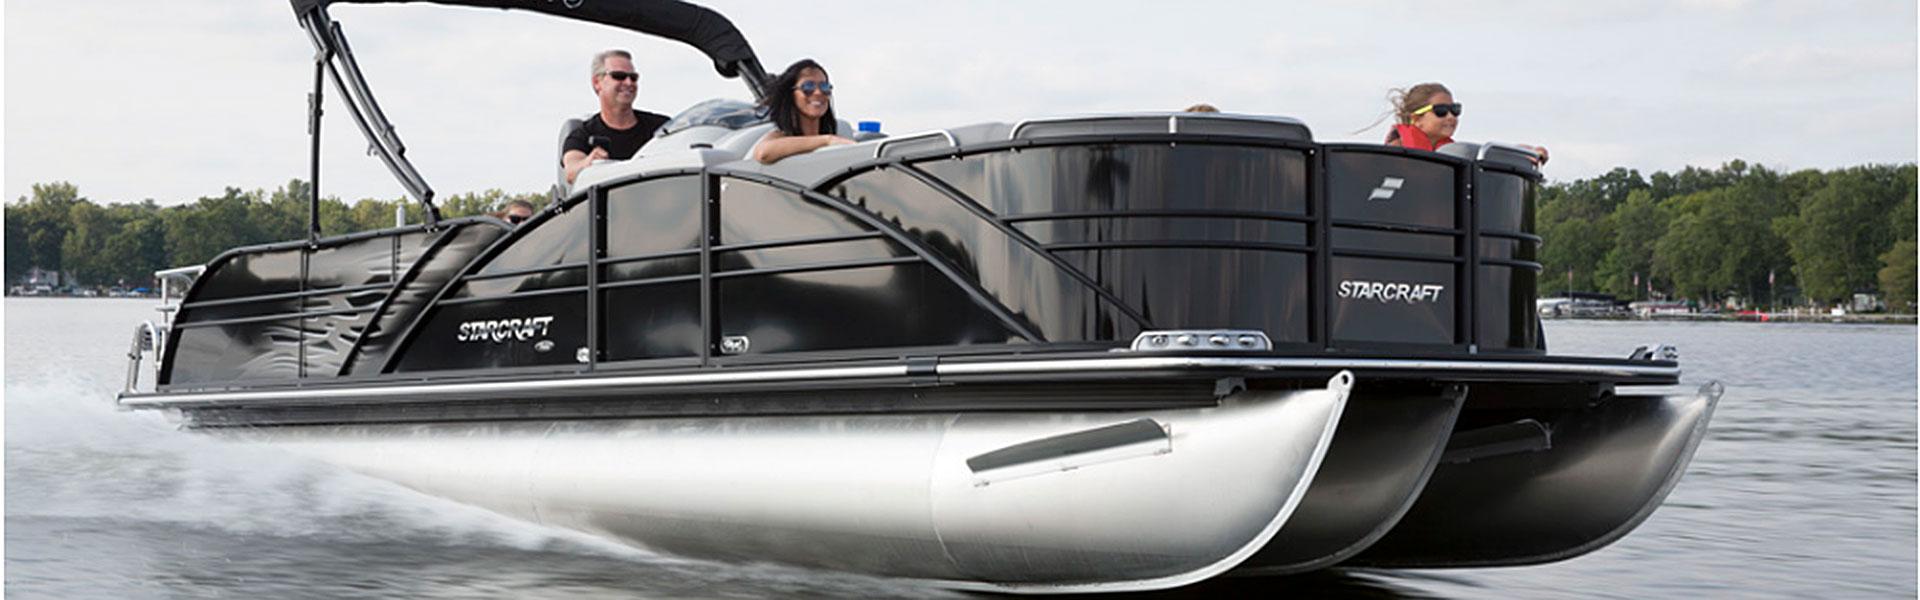 Starcraft pontoon action picture